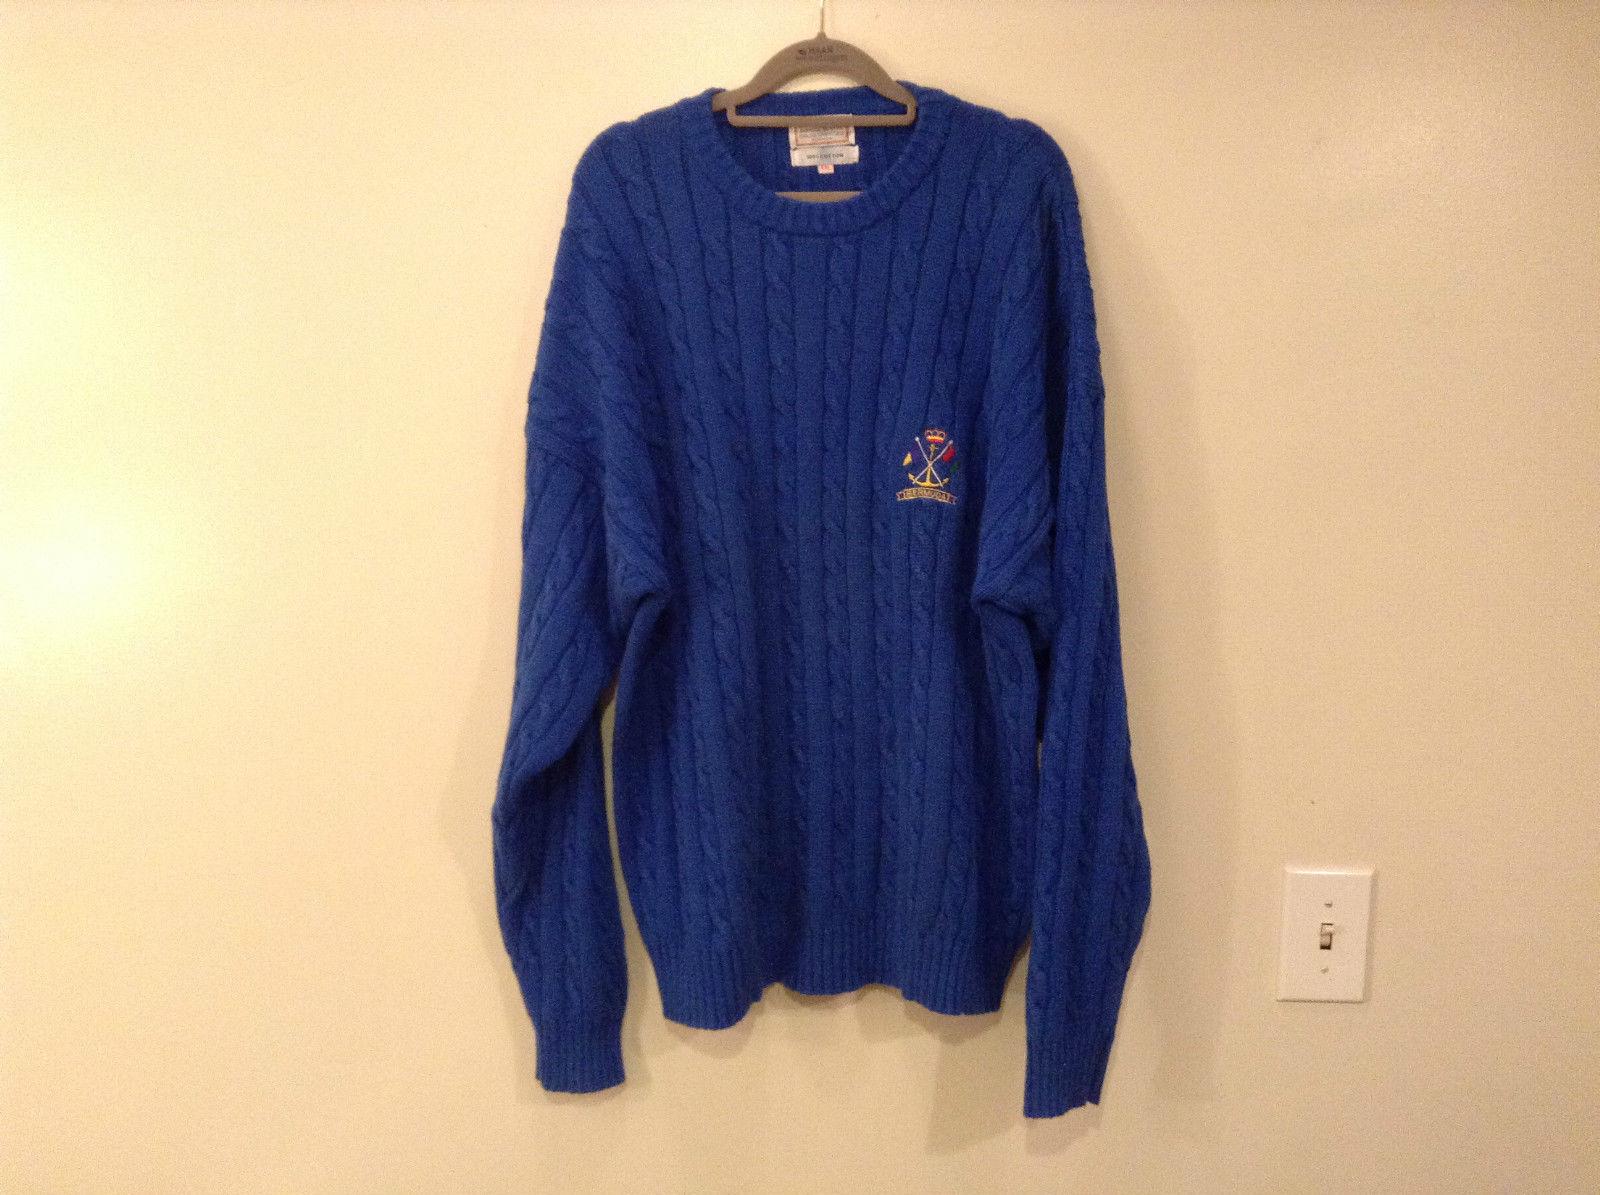 Bermuda Yachting Blue Knit Long Sleeve 100 Percent Cotton Sweater Size XXL